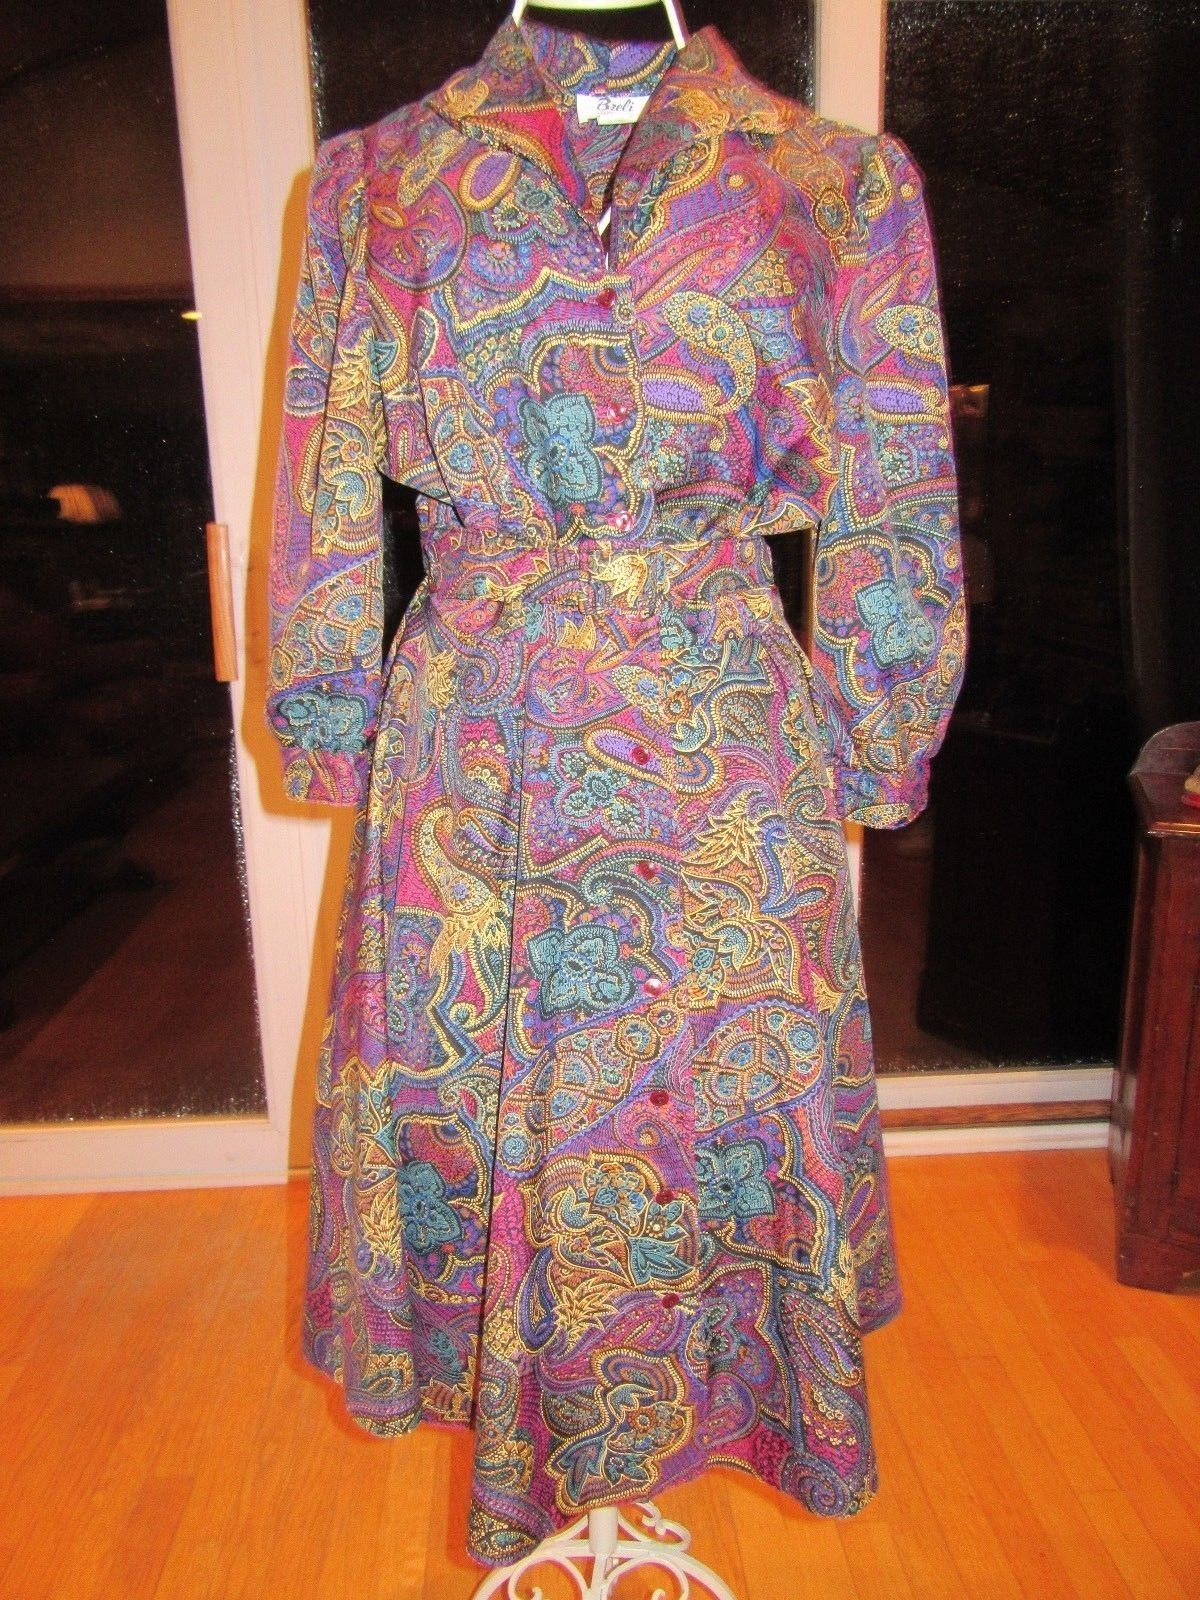 ebe12eea5e28e 8G/VTG Women's Breli Originals and similar items